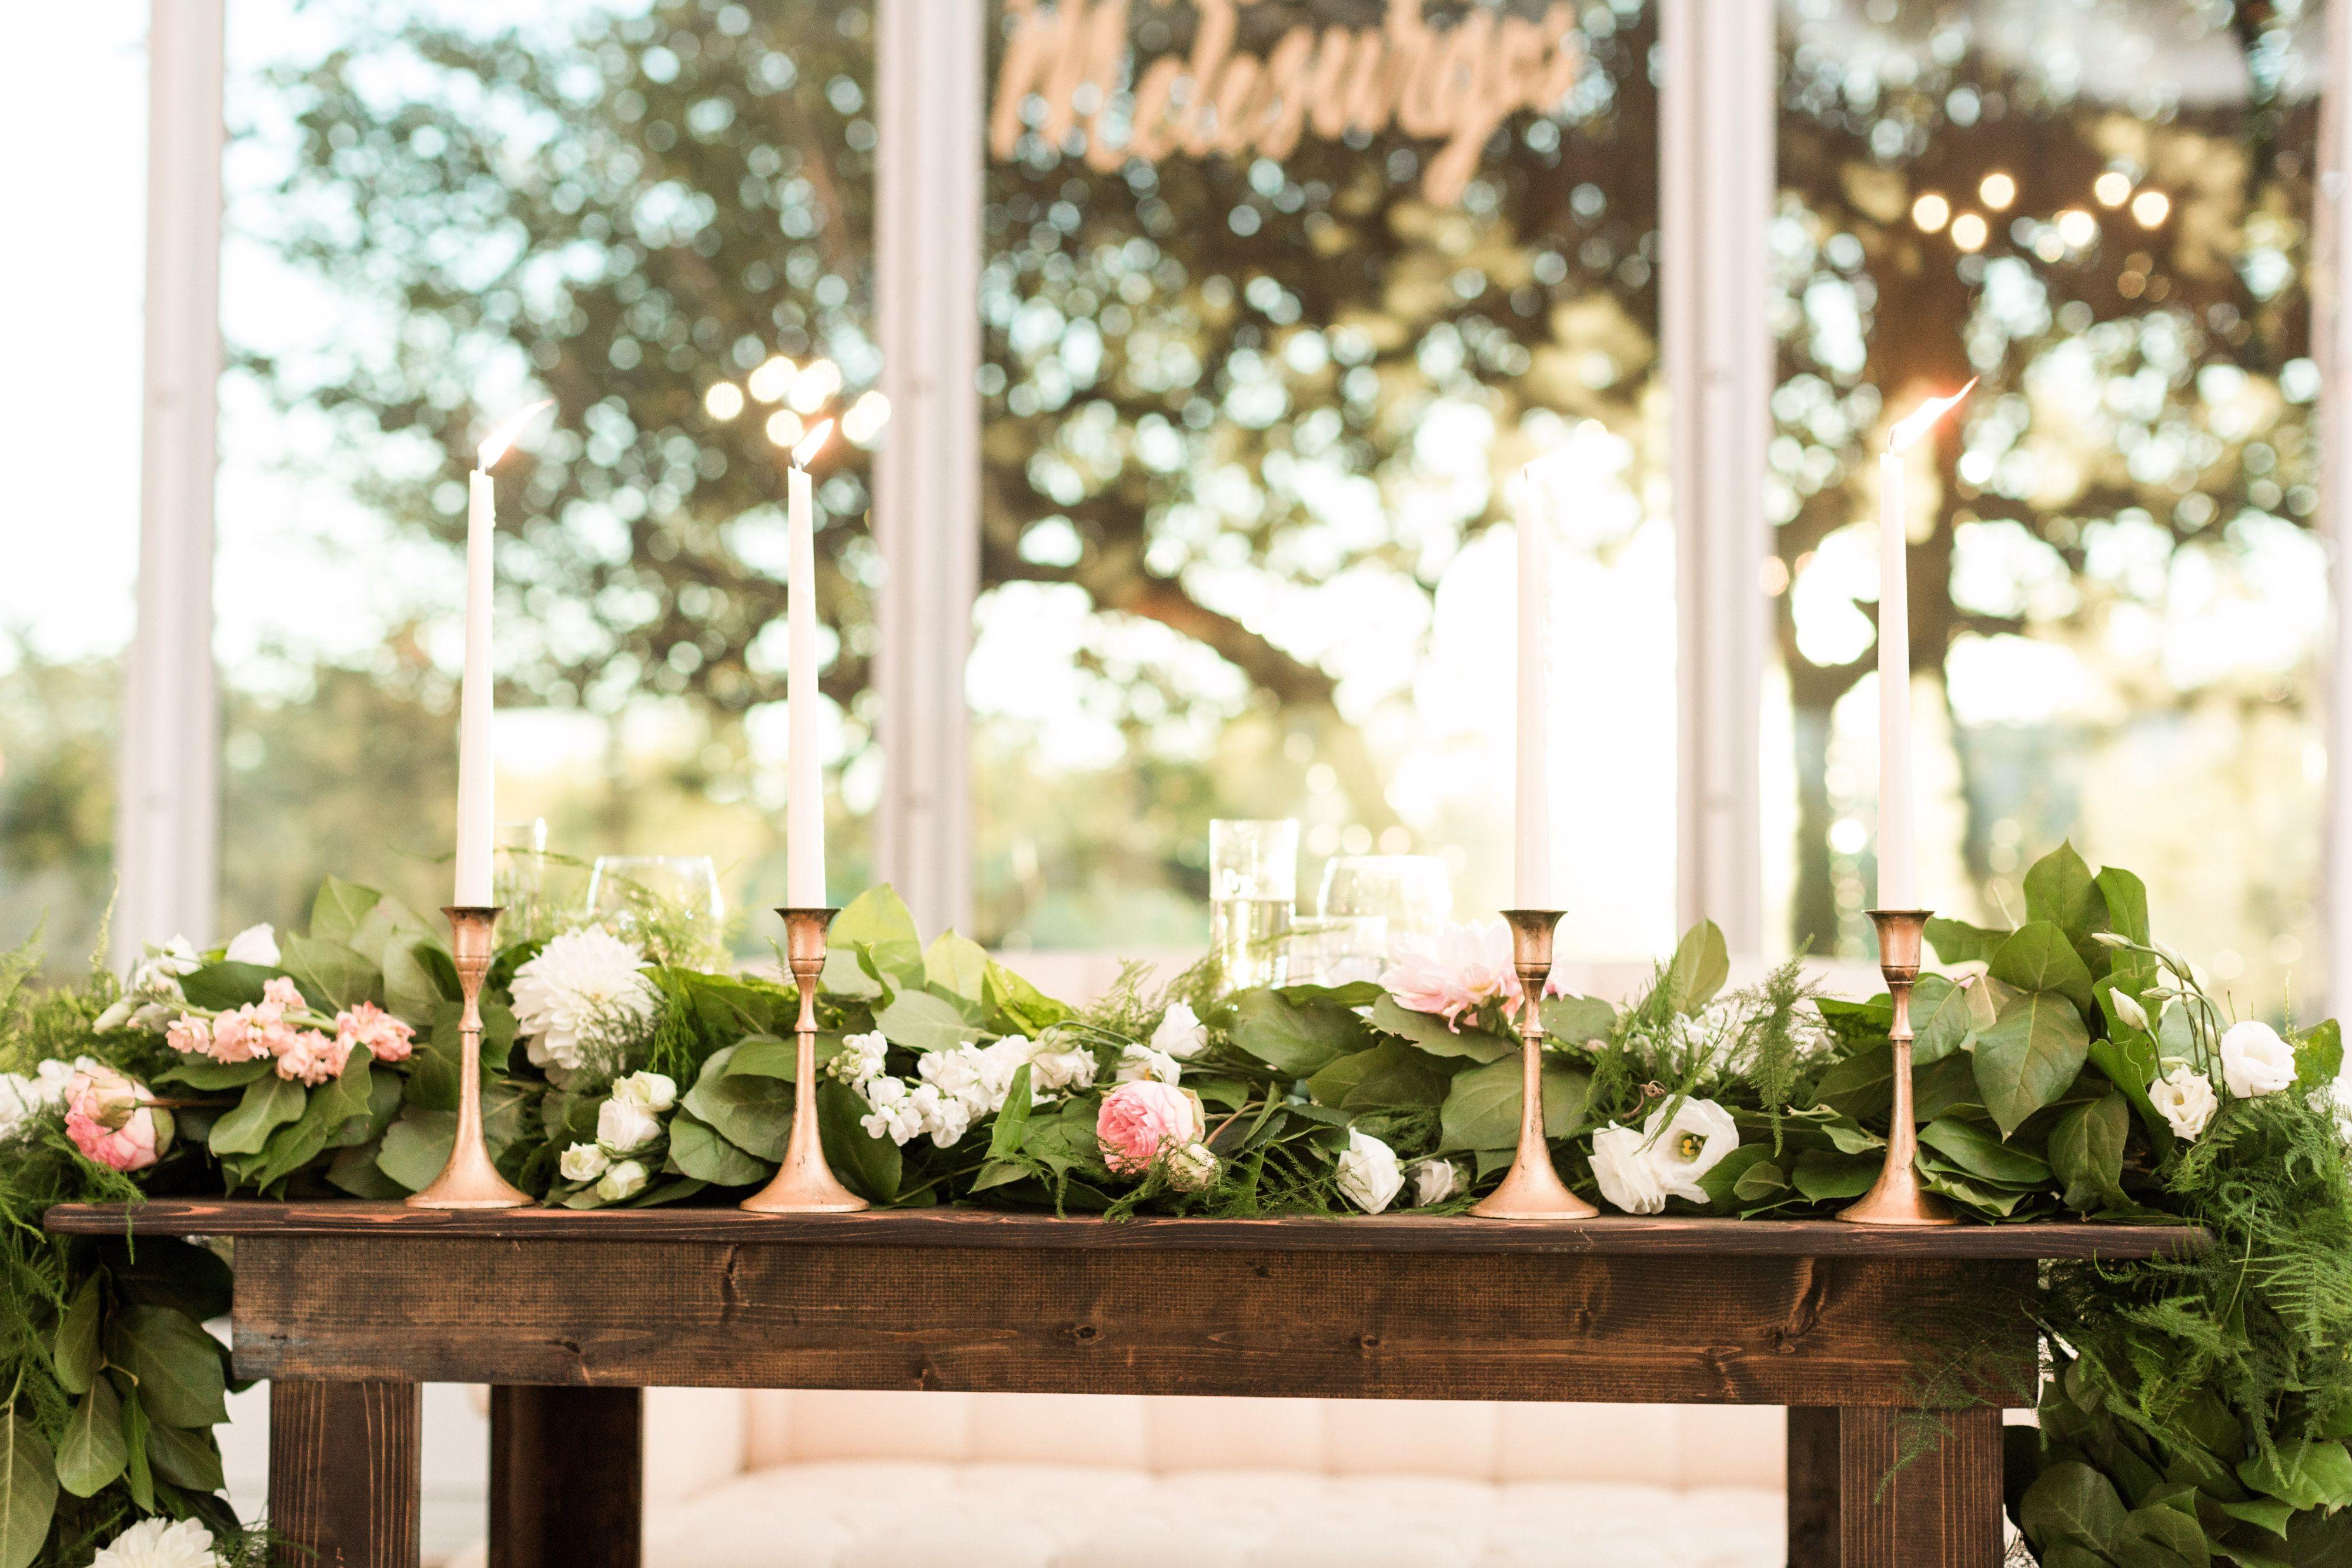 Sweetheart table design photo christy nicole photography blue home sweetheart tablesecret gardensfloral arrangementsjasmineflower izmirmasajfo